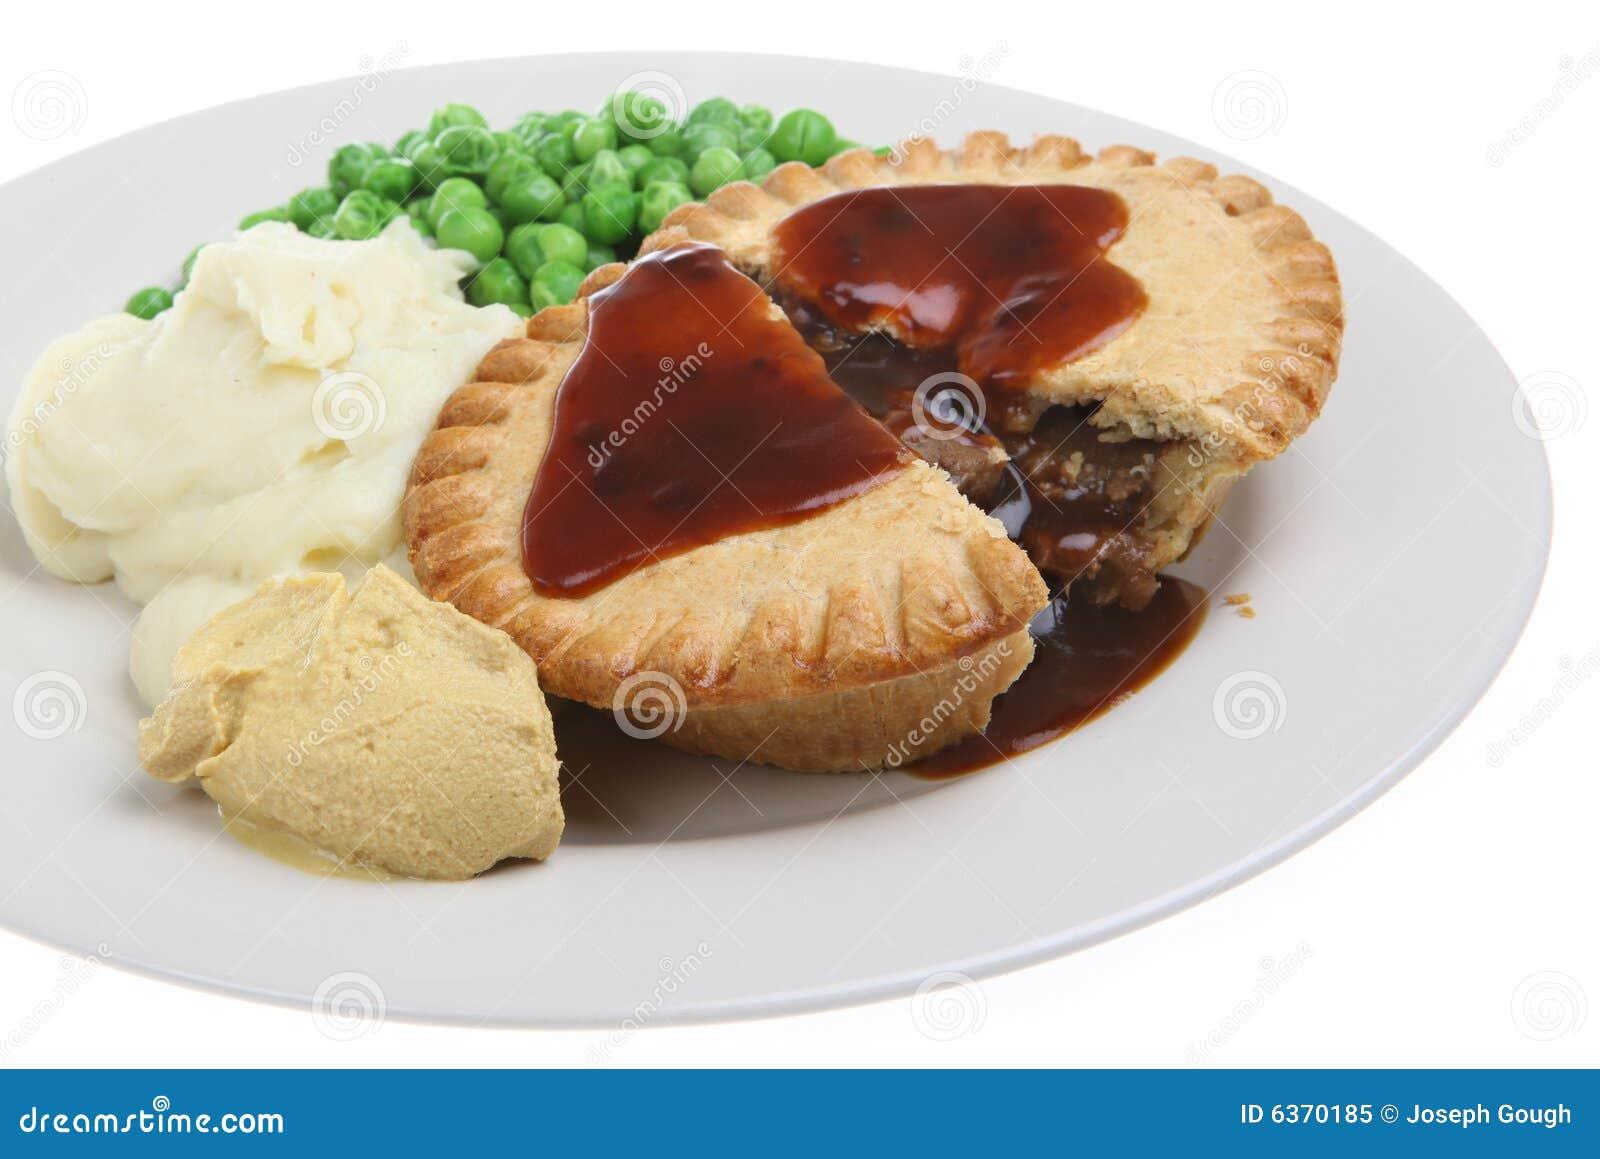 Steak Pie & Mash Royalty Free Stock Photo - Image: 6370185